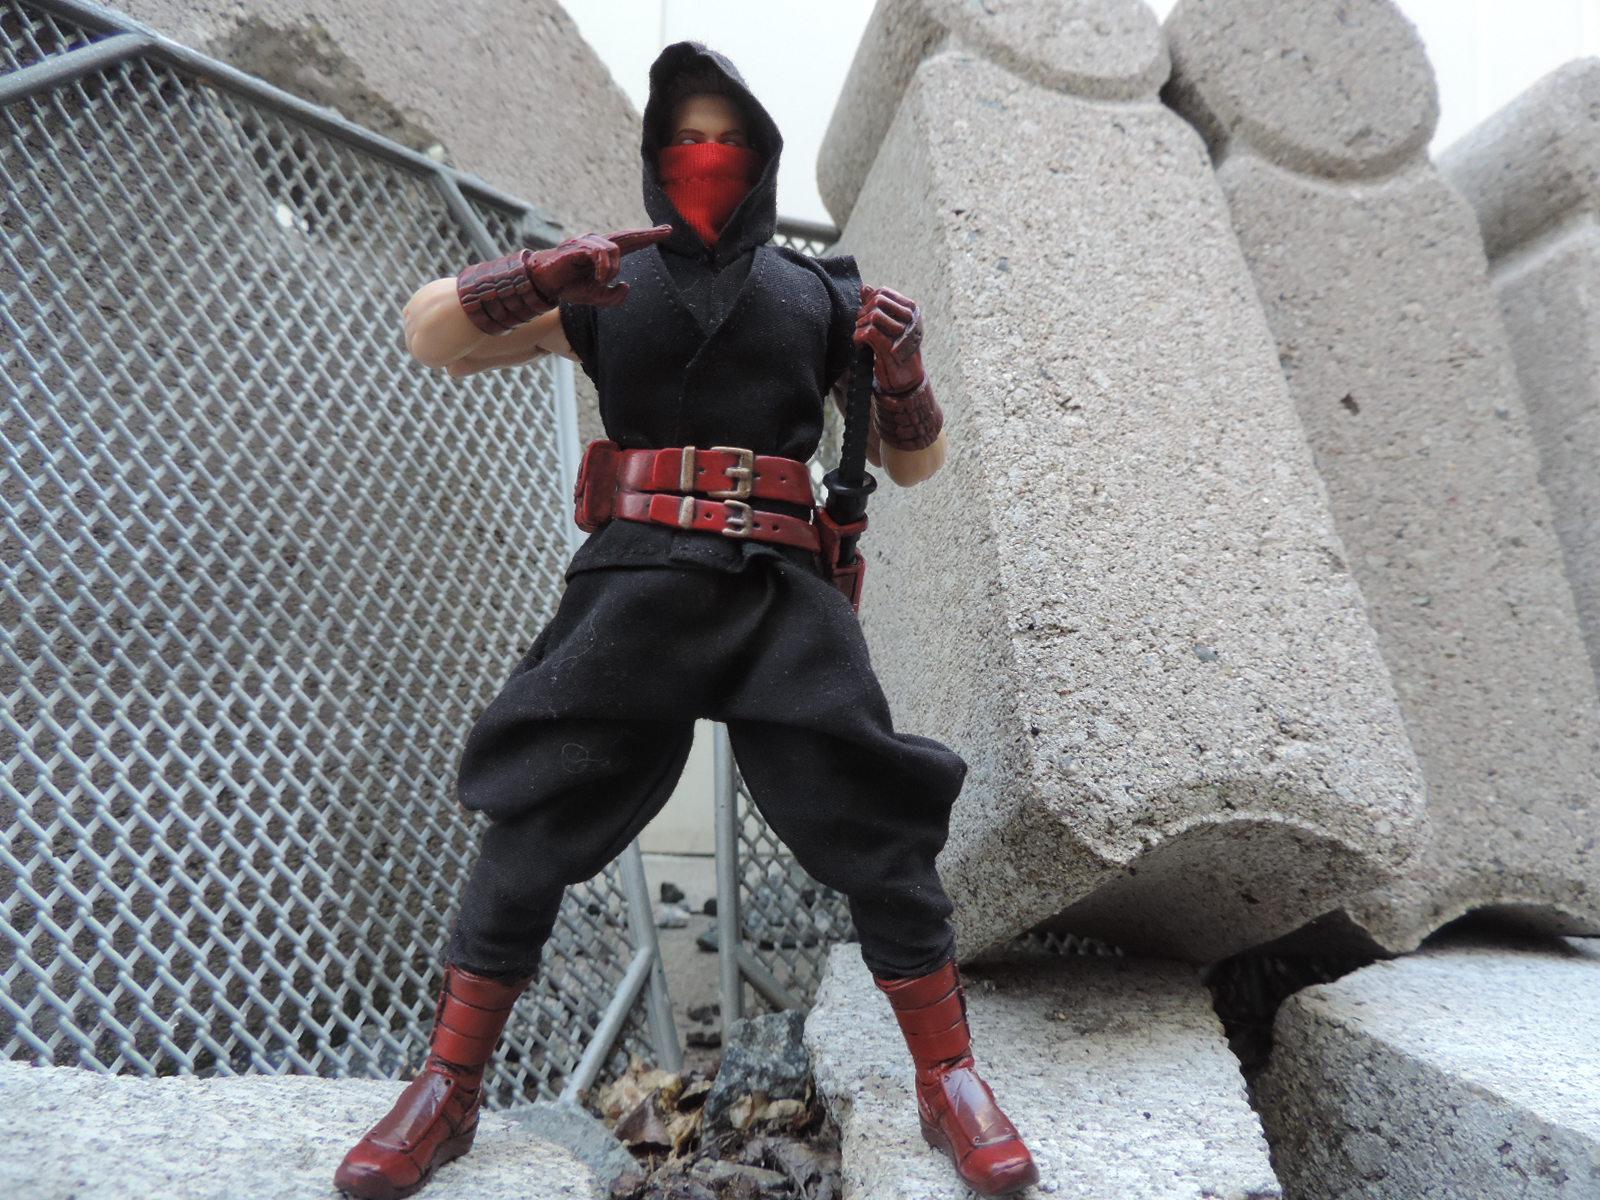 Cjesim Custom Ninja Suits For 6 Inch Figures The Fwoosh